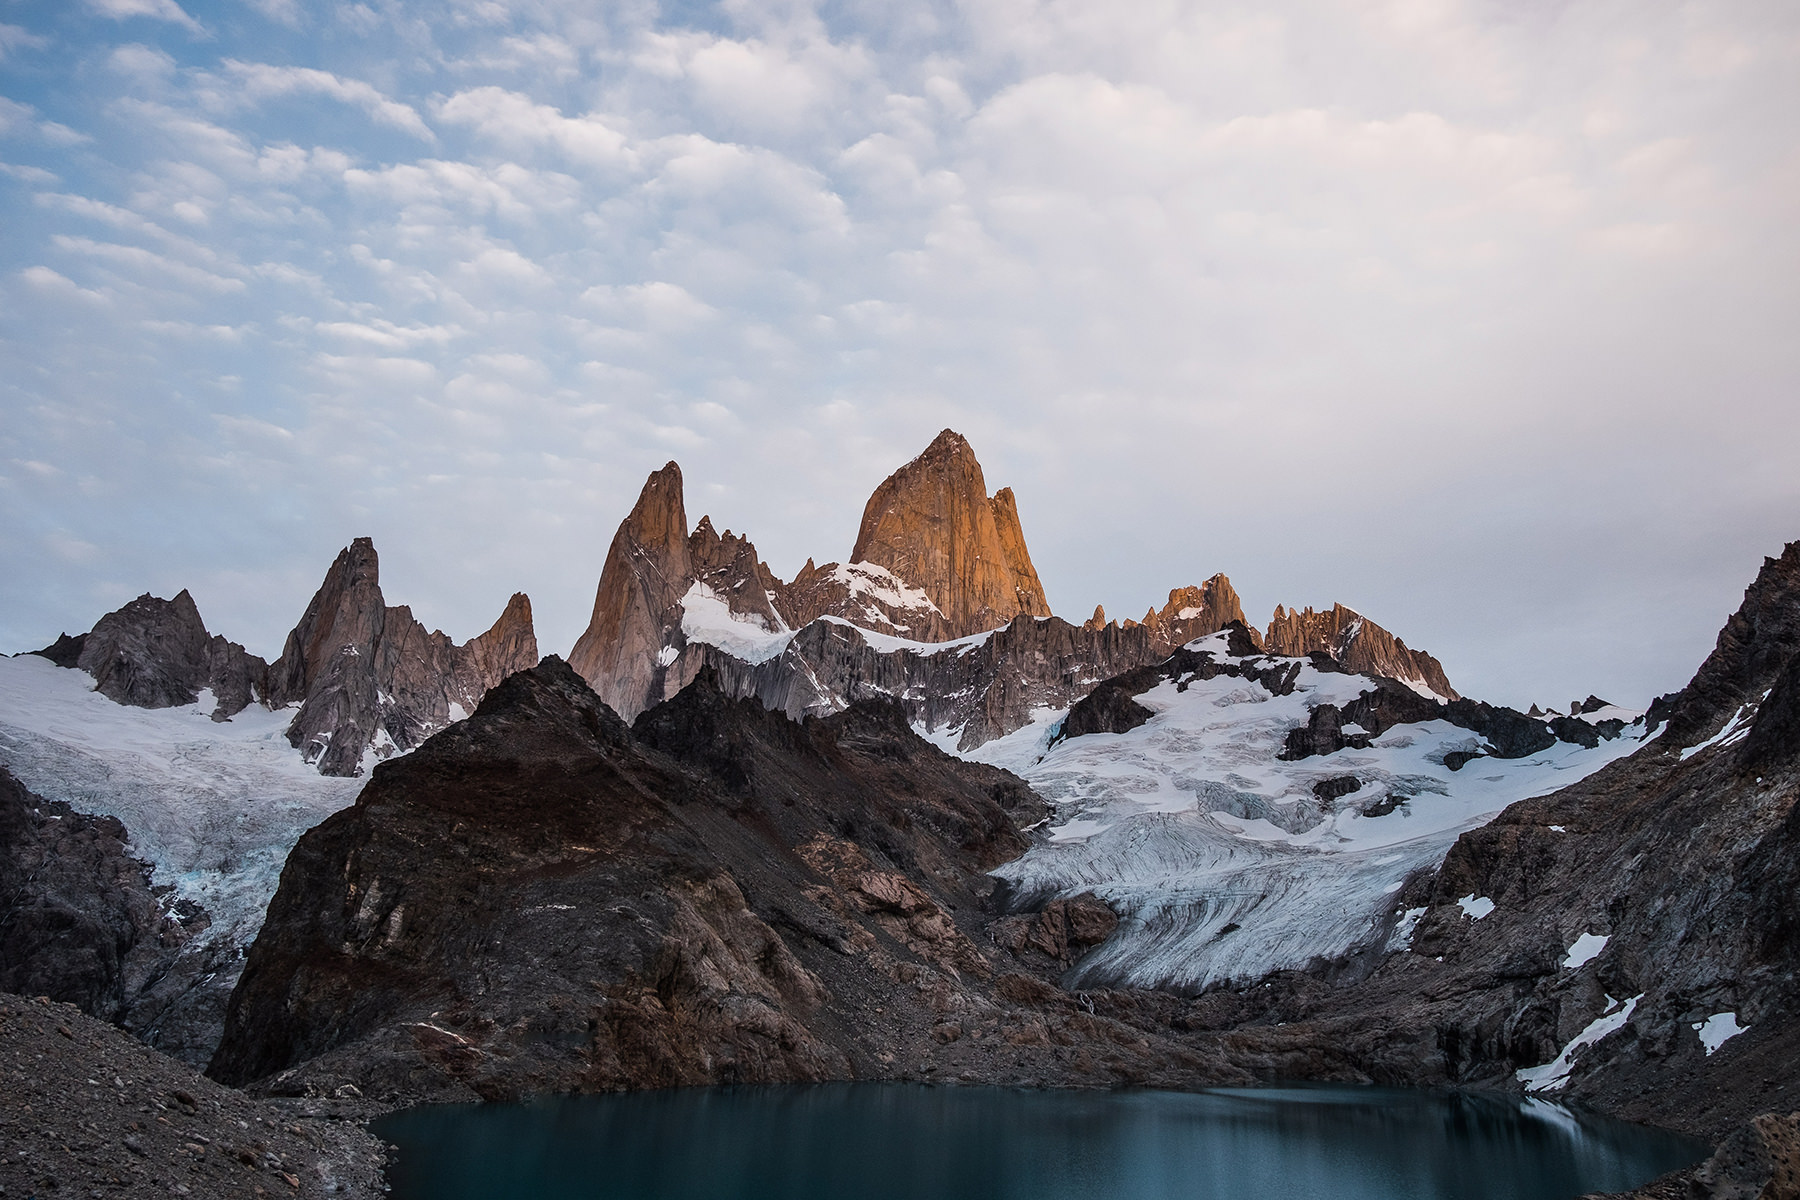 Wandern in Argentinien - Wandertipps